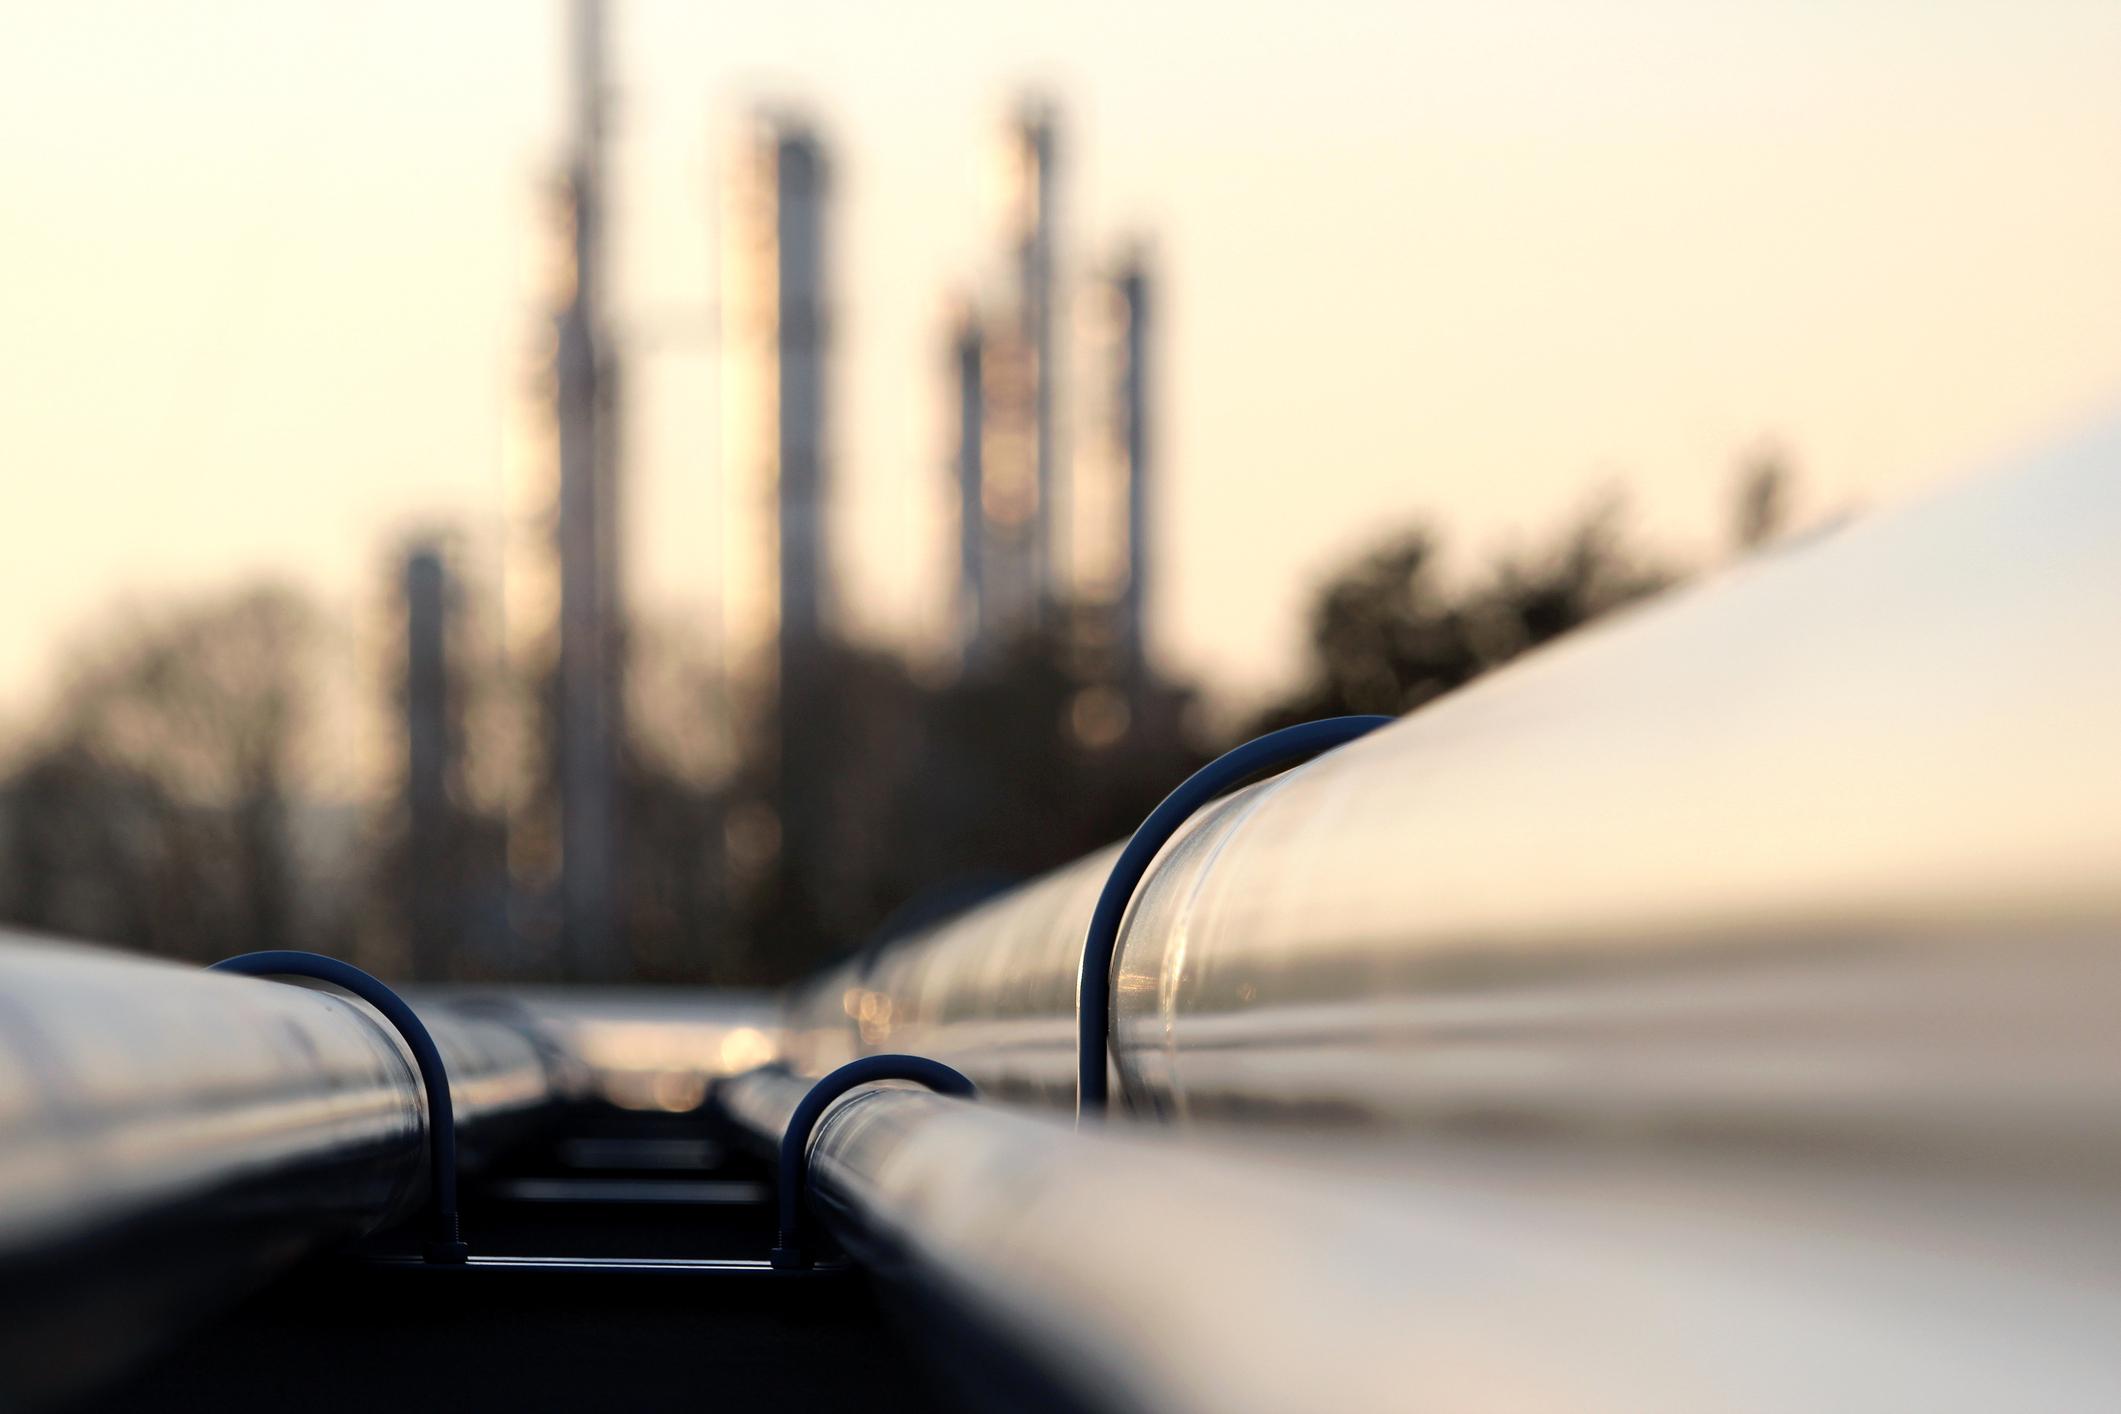 Pipelines headed toward a refinery.